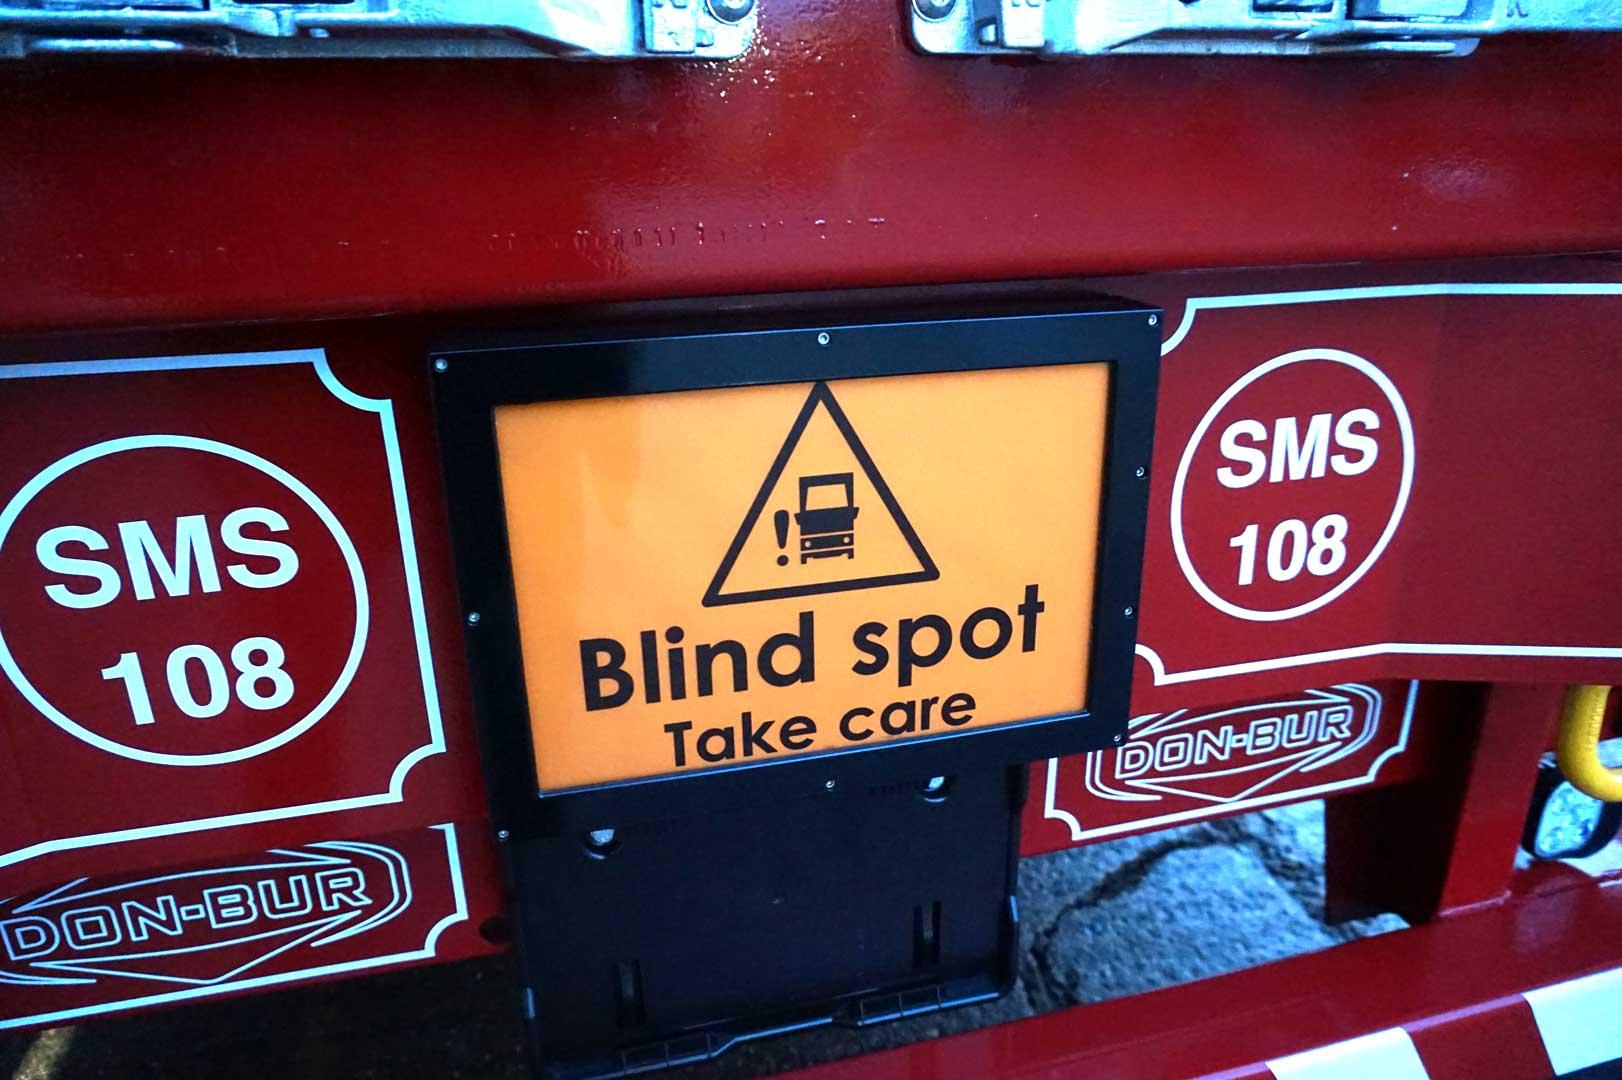 Flashing Rear Blind Spot Sign